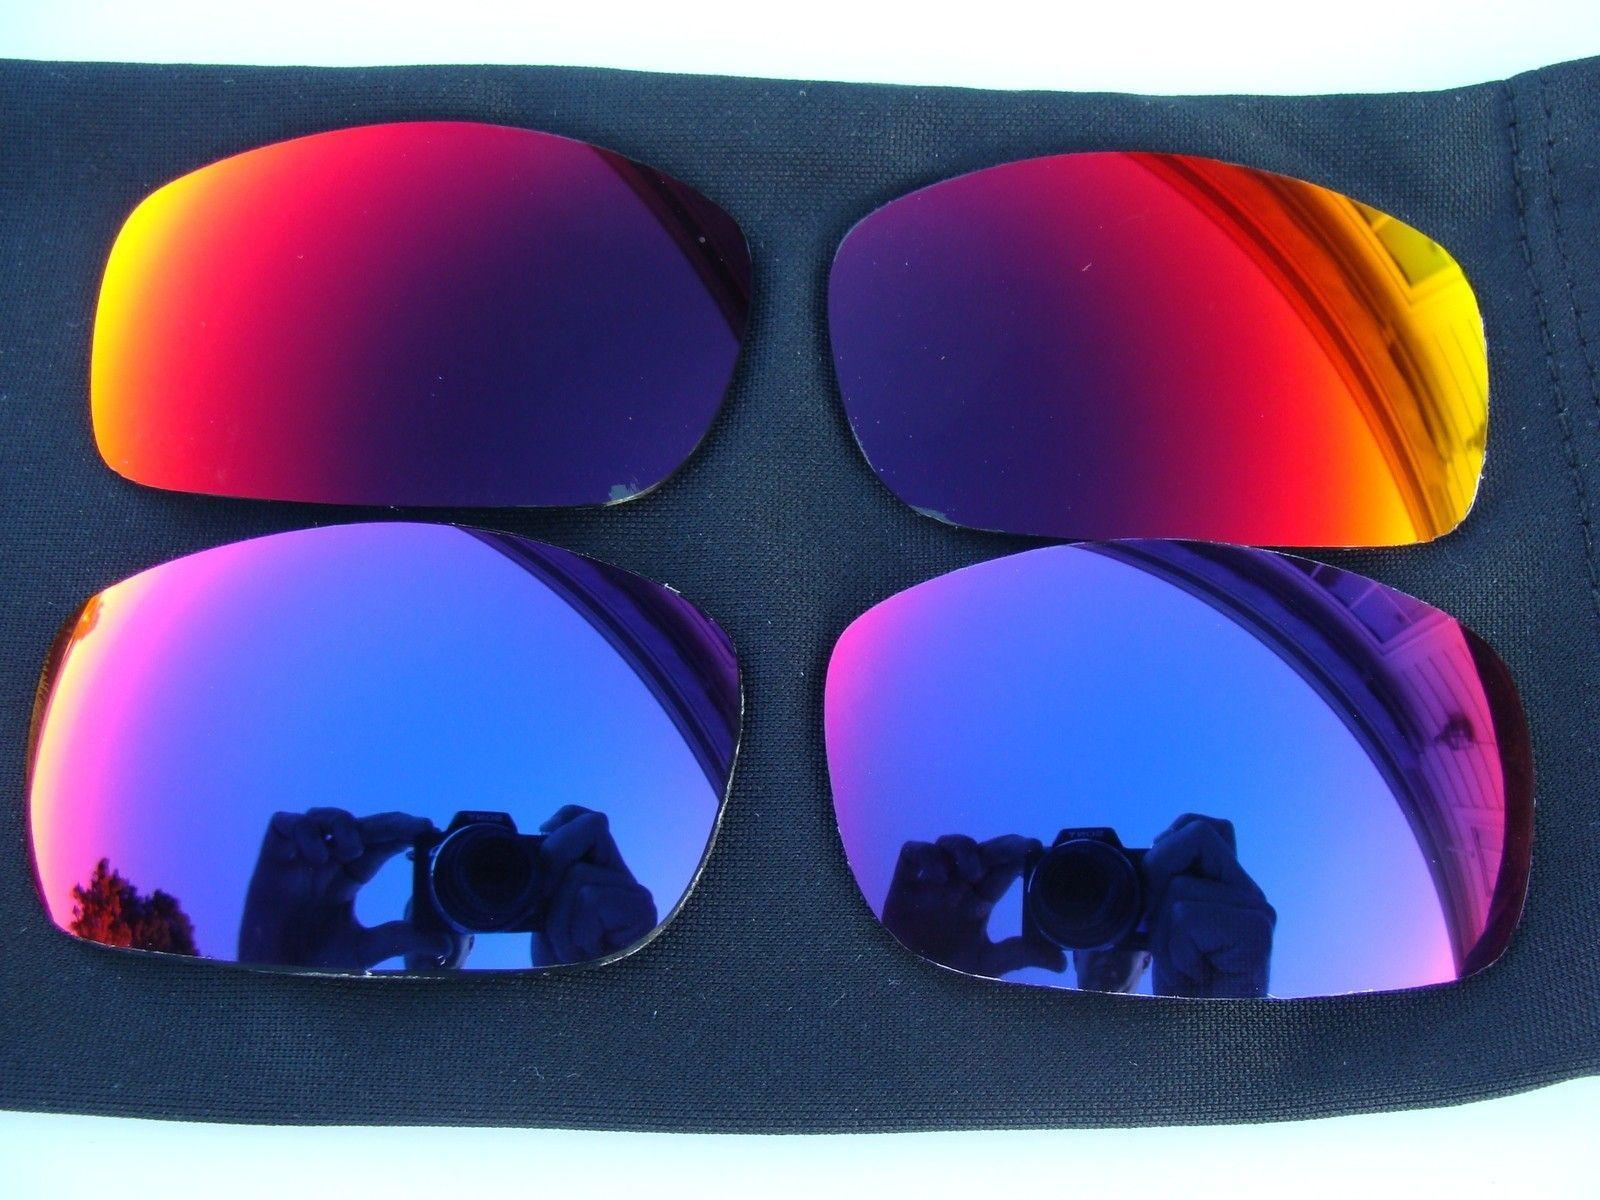 Updated Thread 9/24: Custom Cut XS Lenses: Violet, Pos Red, - DSC04569.JPG